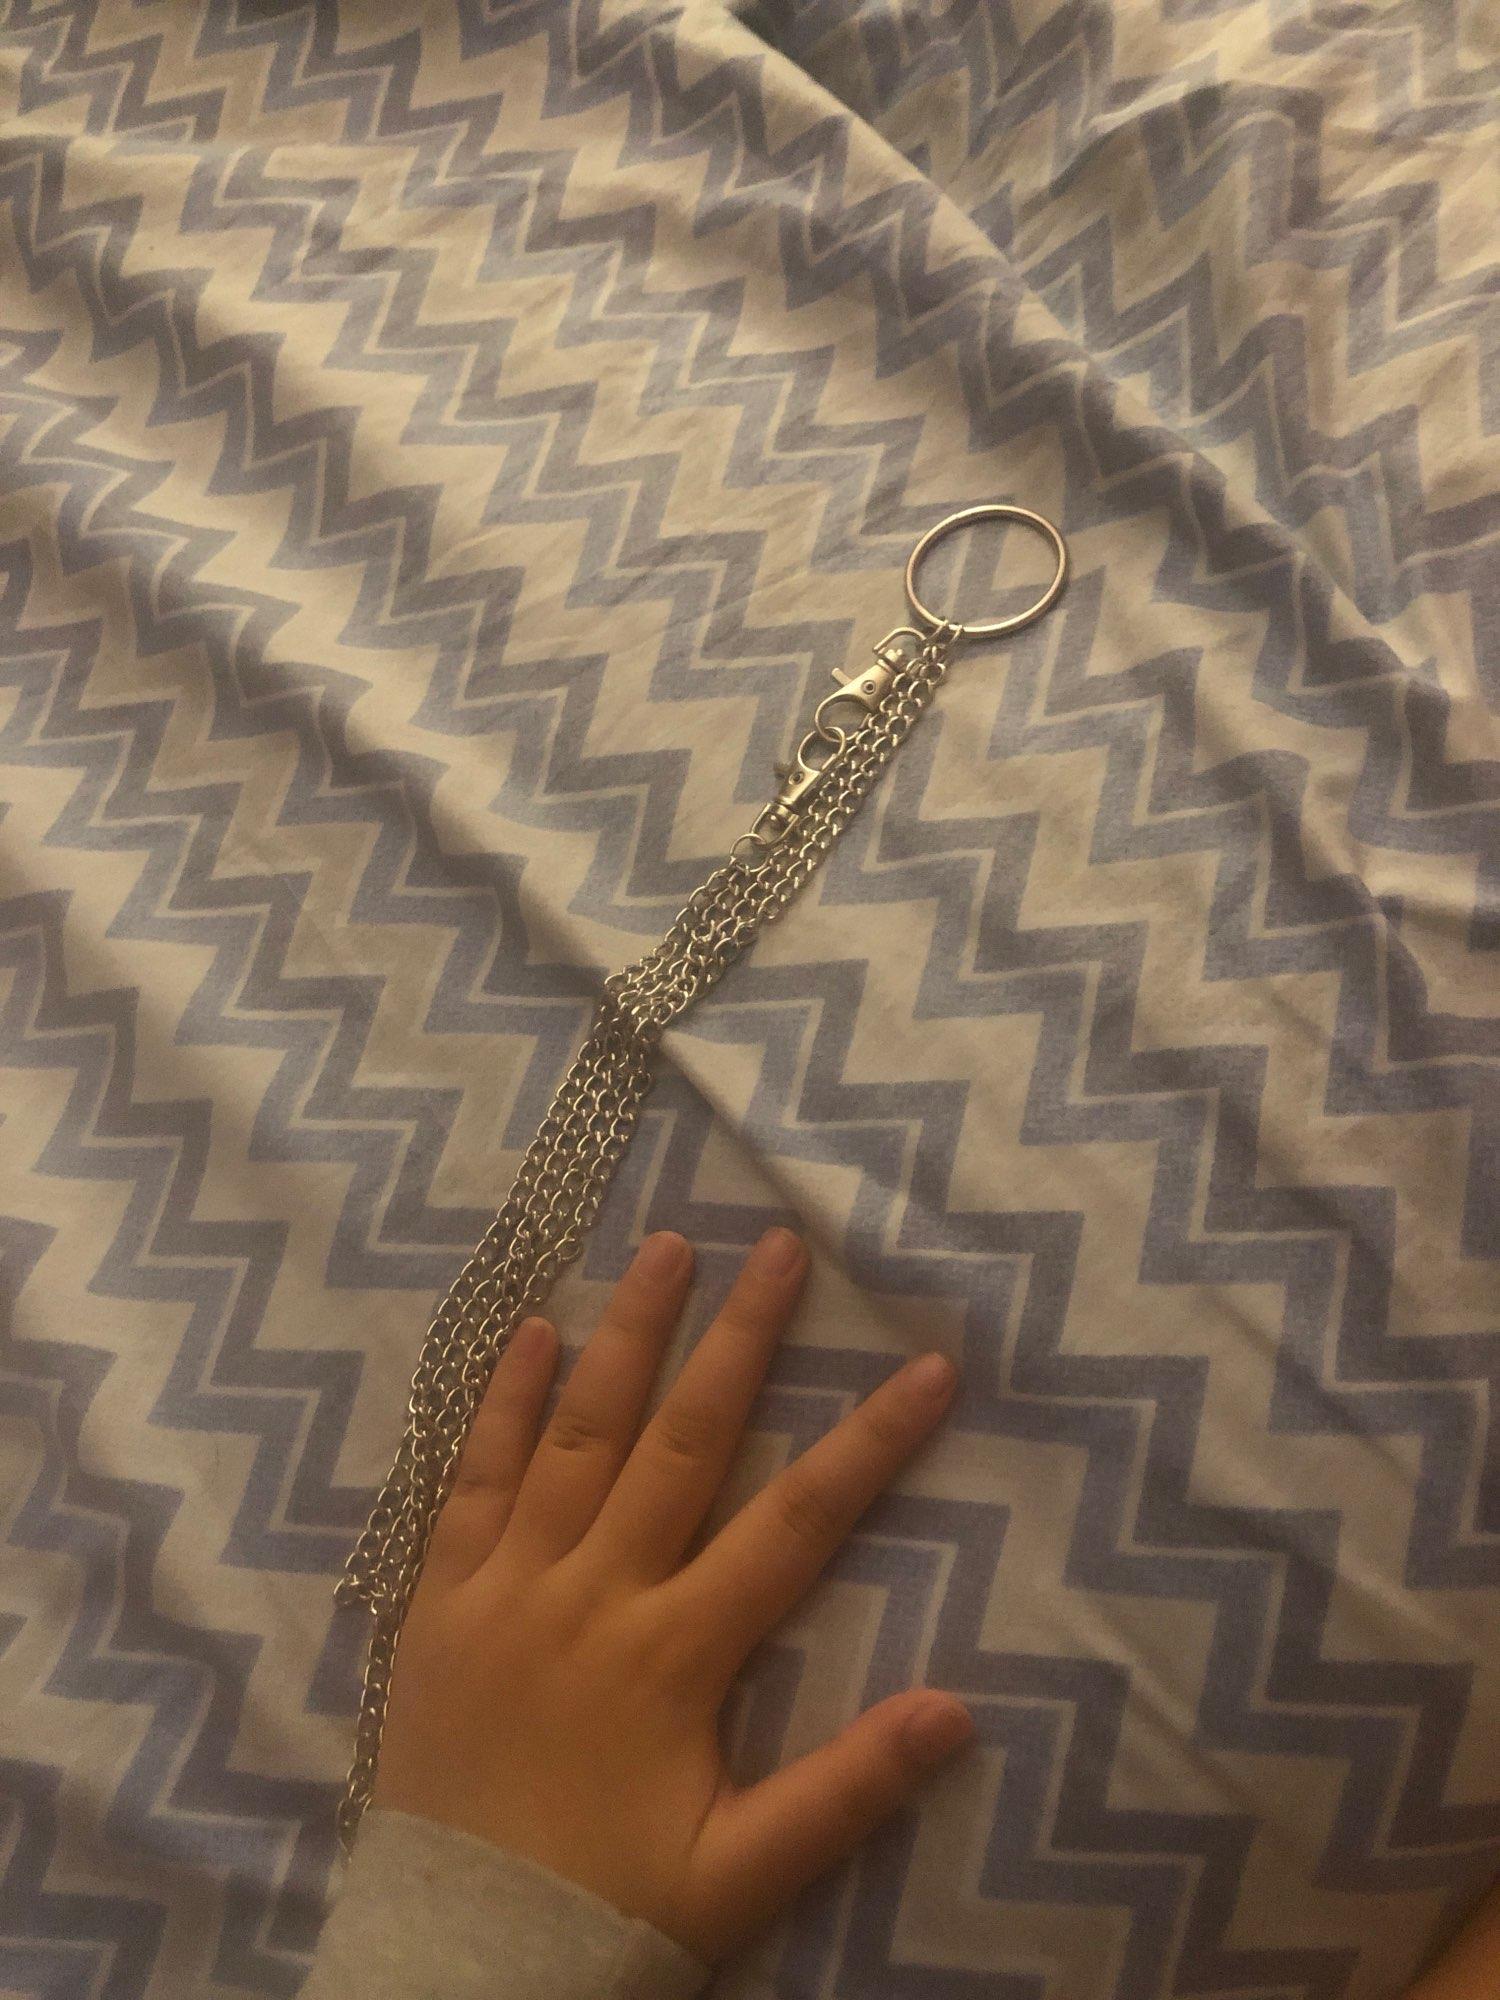 Pants Waist Chain E-boy E-girl photo review